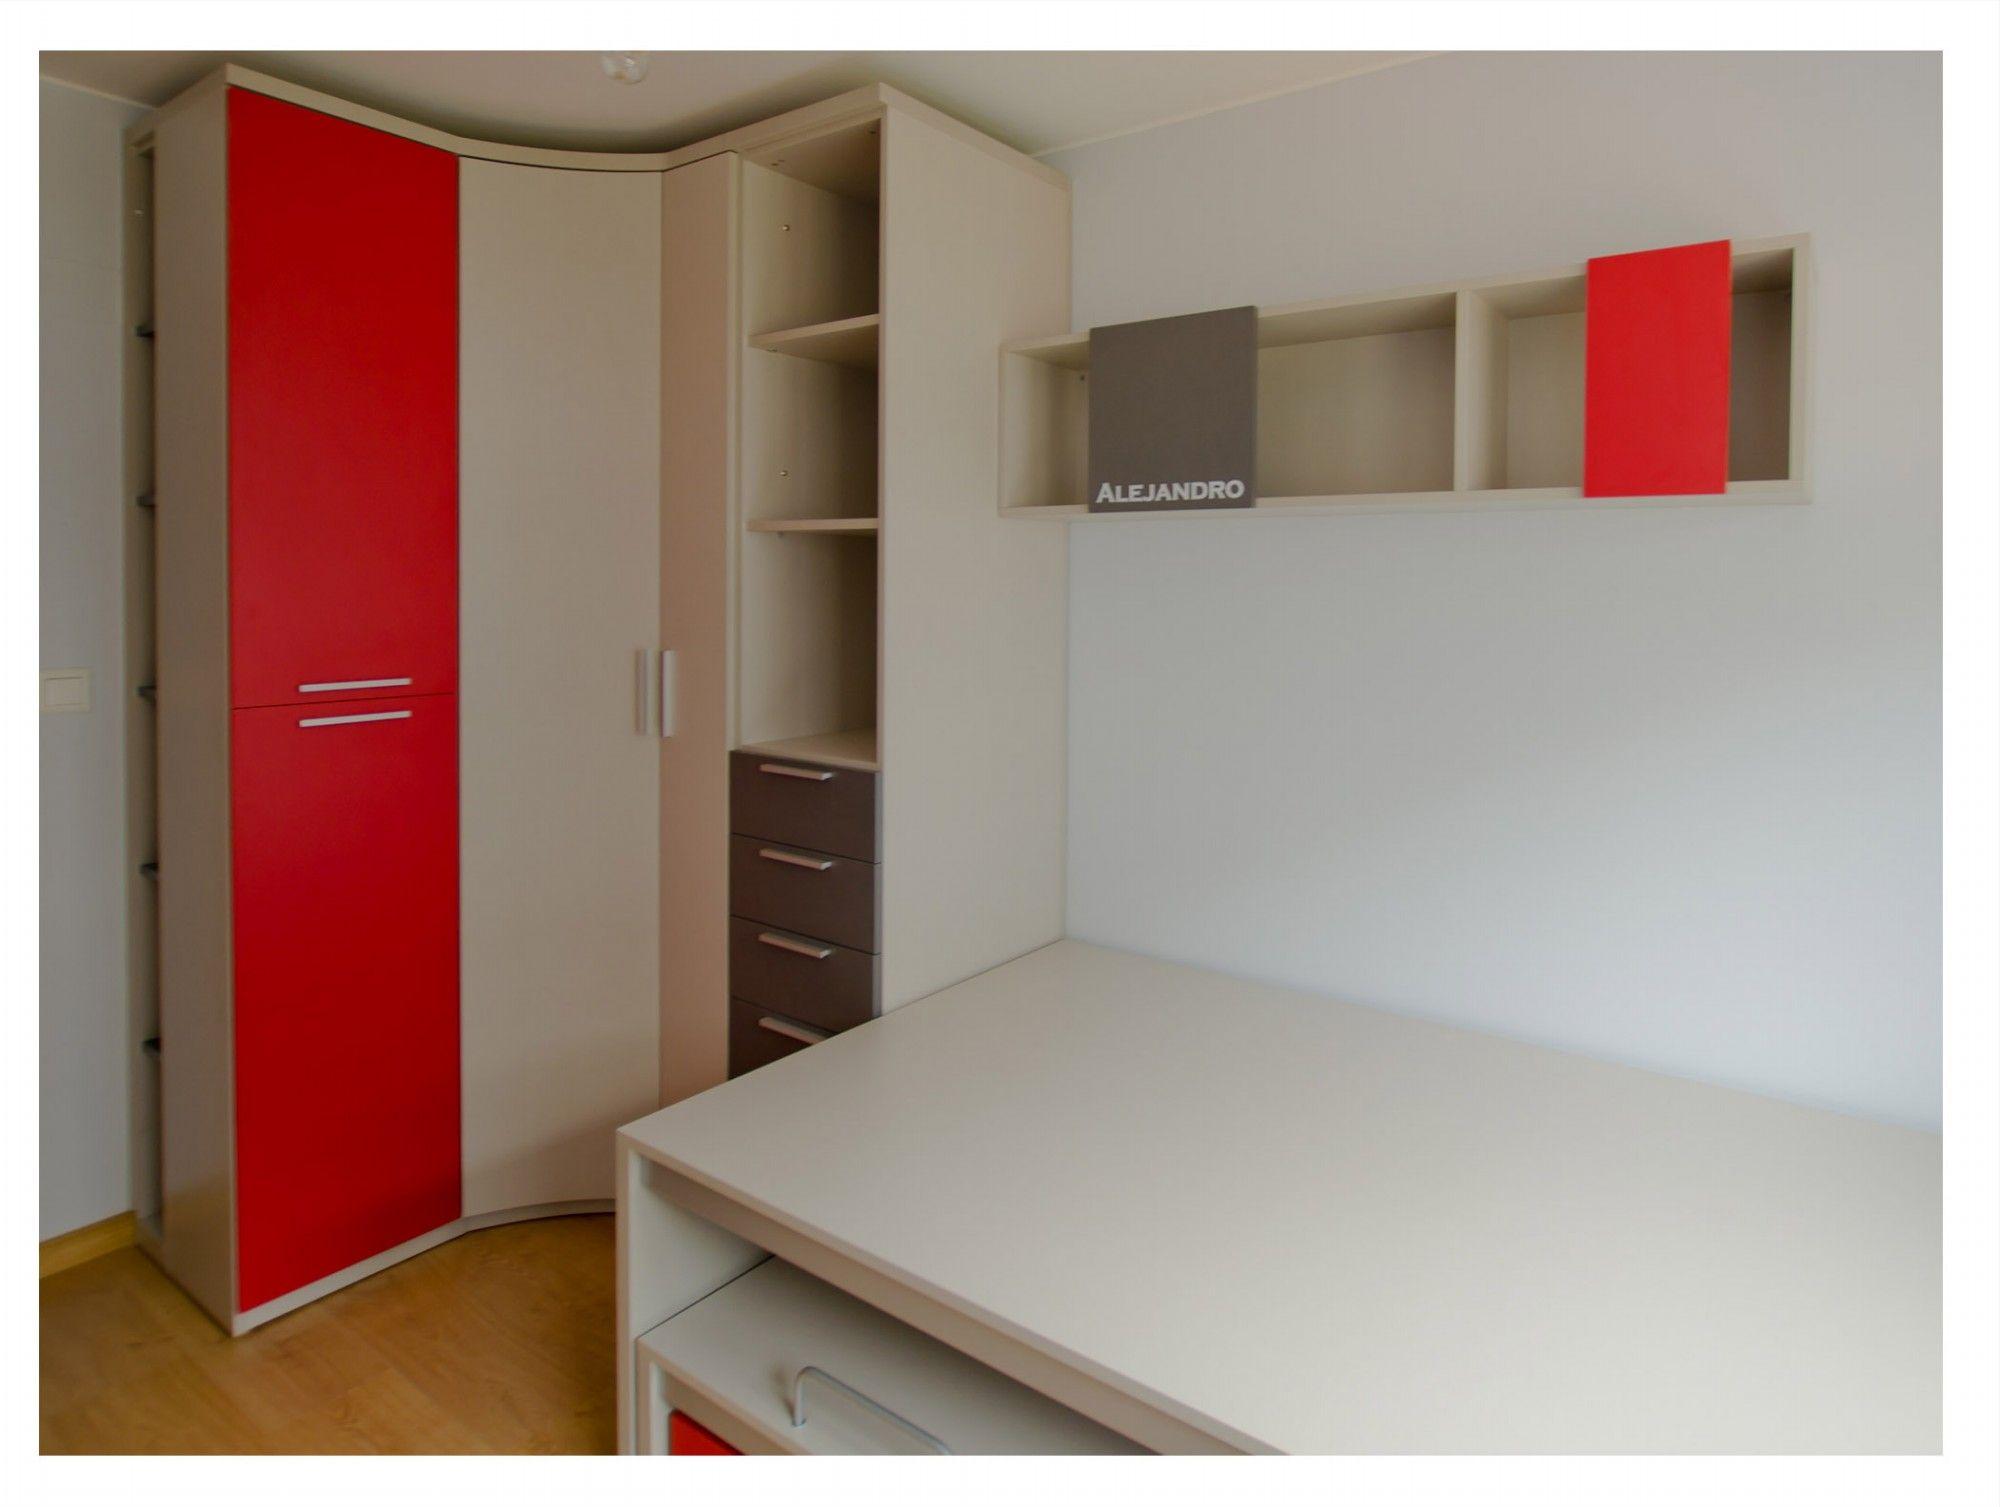 Muebles Soluciones La Jota - Habitaci N Juvenil Moderna De Dise O A Medida Y Personalizada Con [mjhdah]https://i.pinimg.com/736x/eb/2d/21/eb2d21a8fde9b4d59f121bd051a49d28–murphy-beds-aragon.jpg